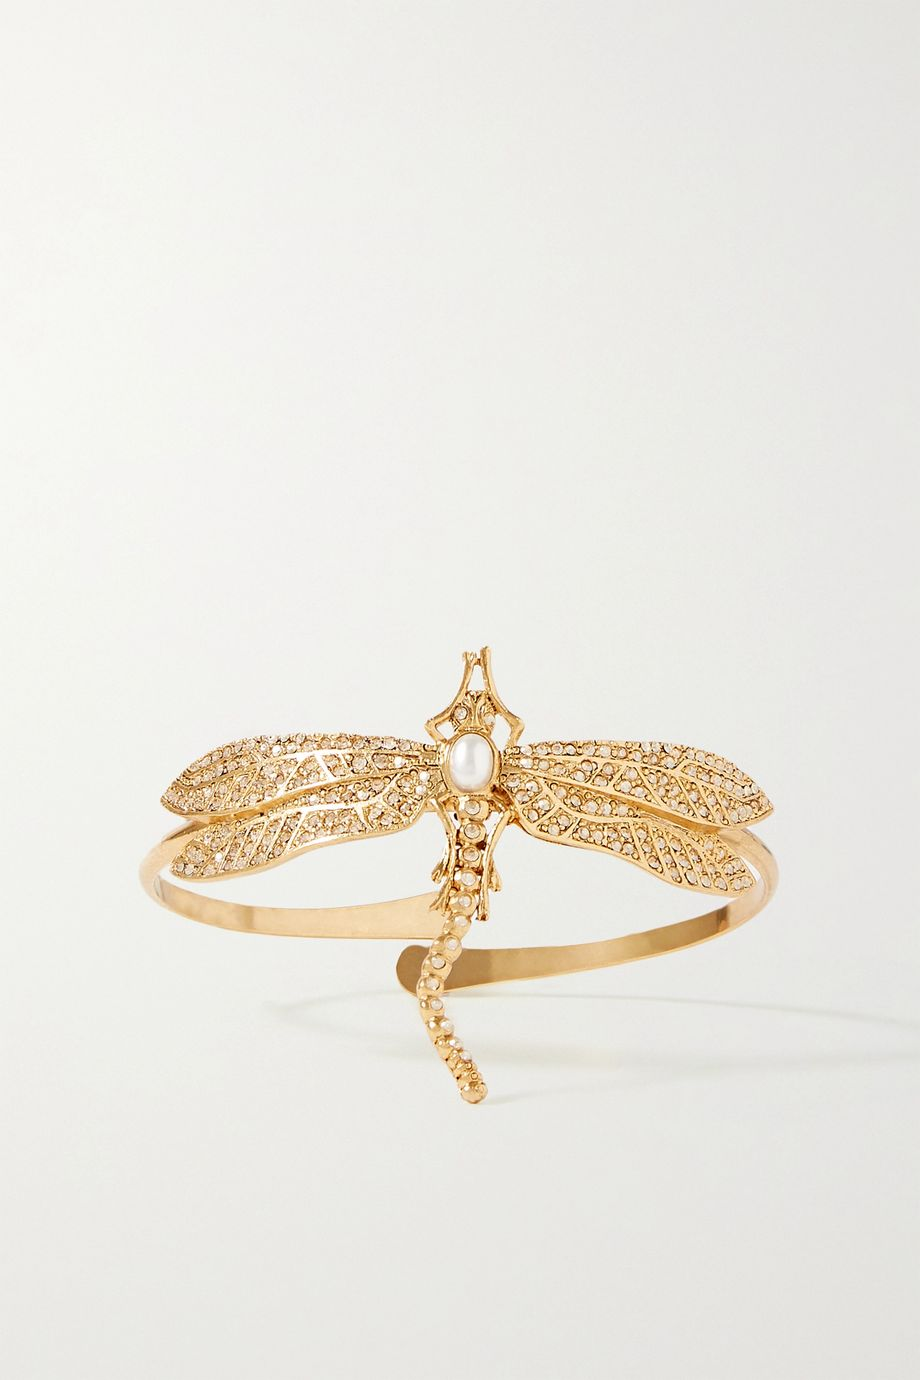 Oscar de la Renta Gold-tone, crystal and faux pearl arm cuff